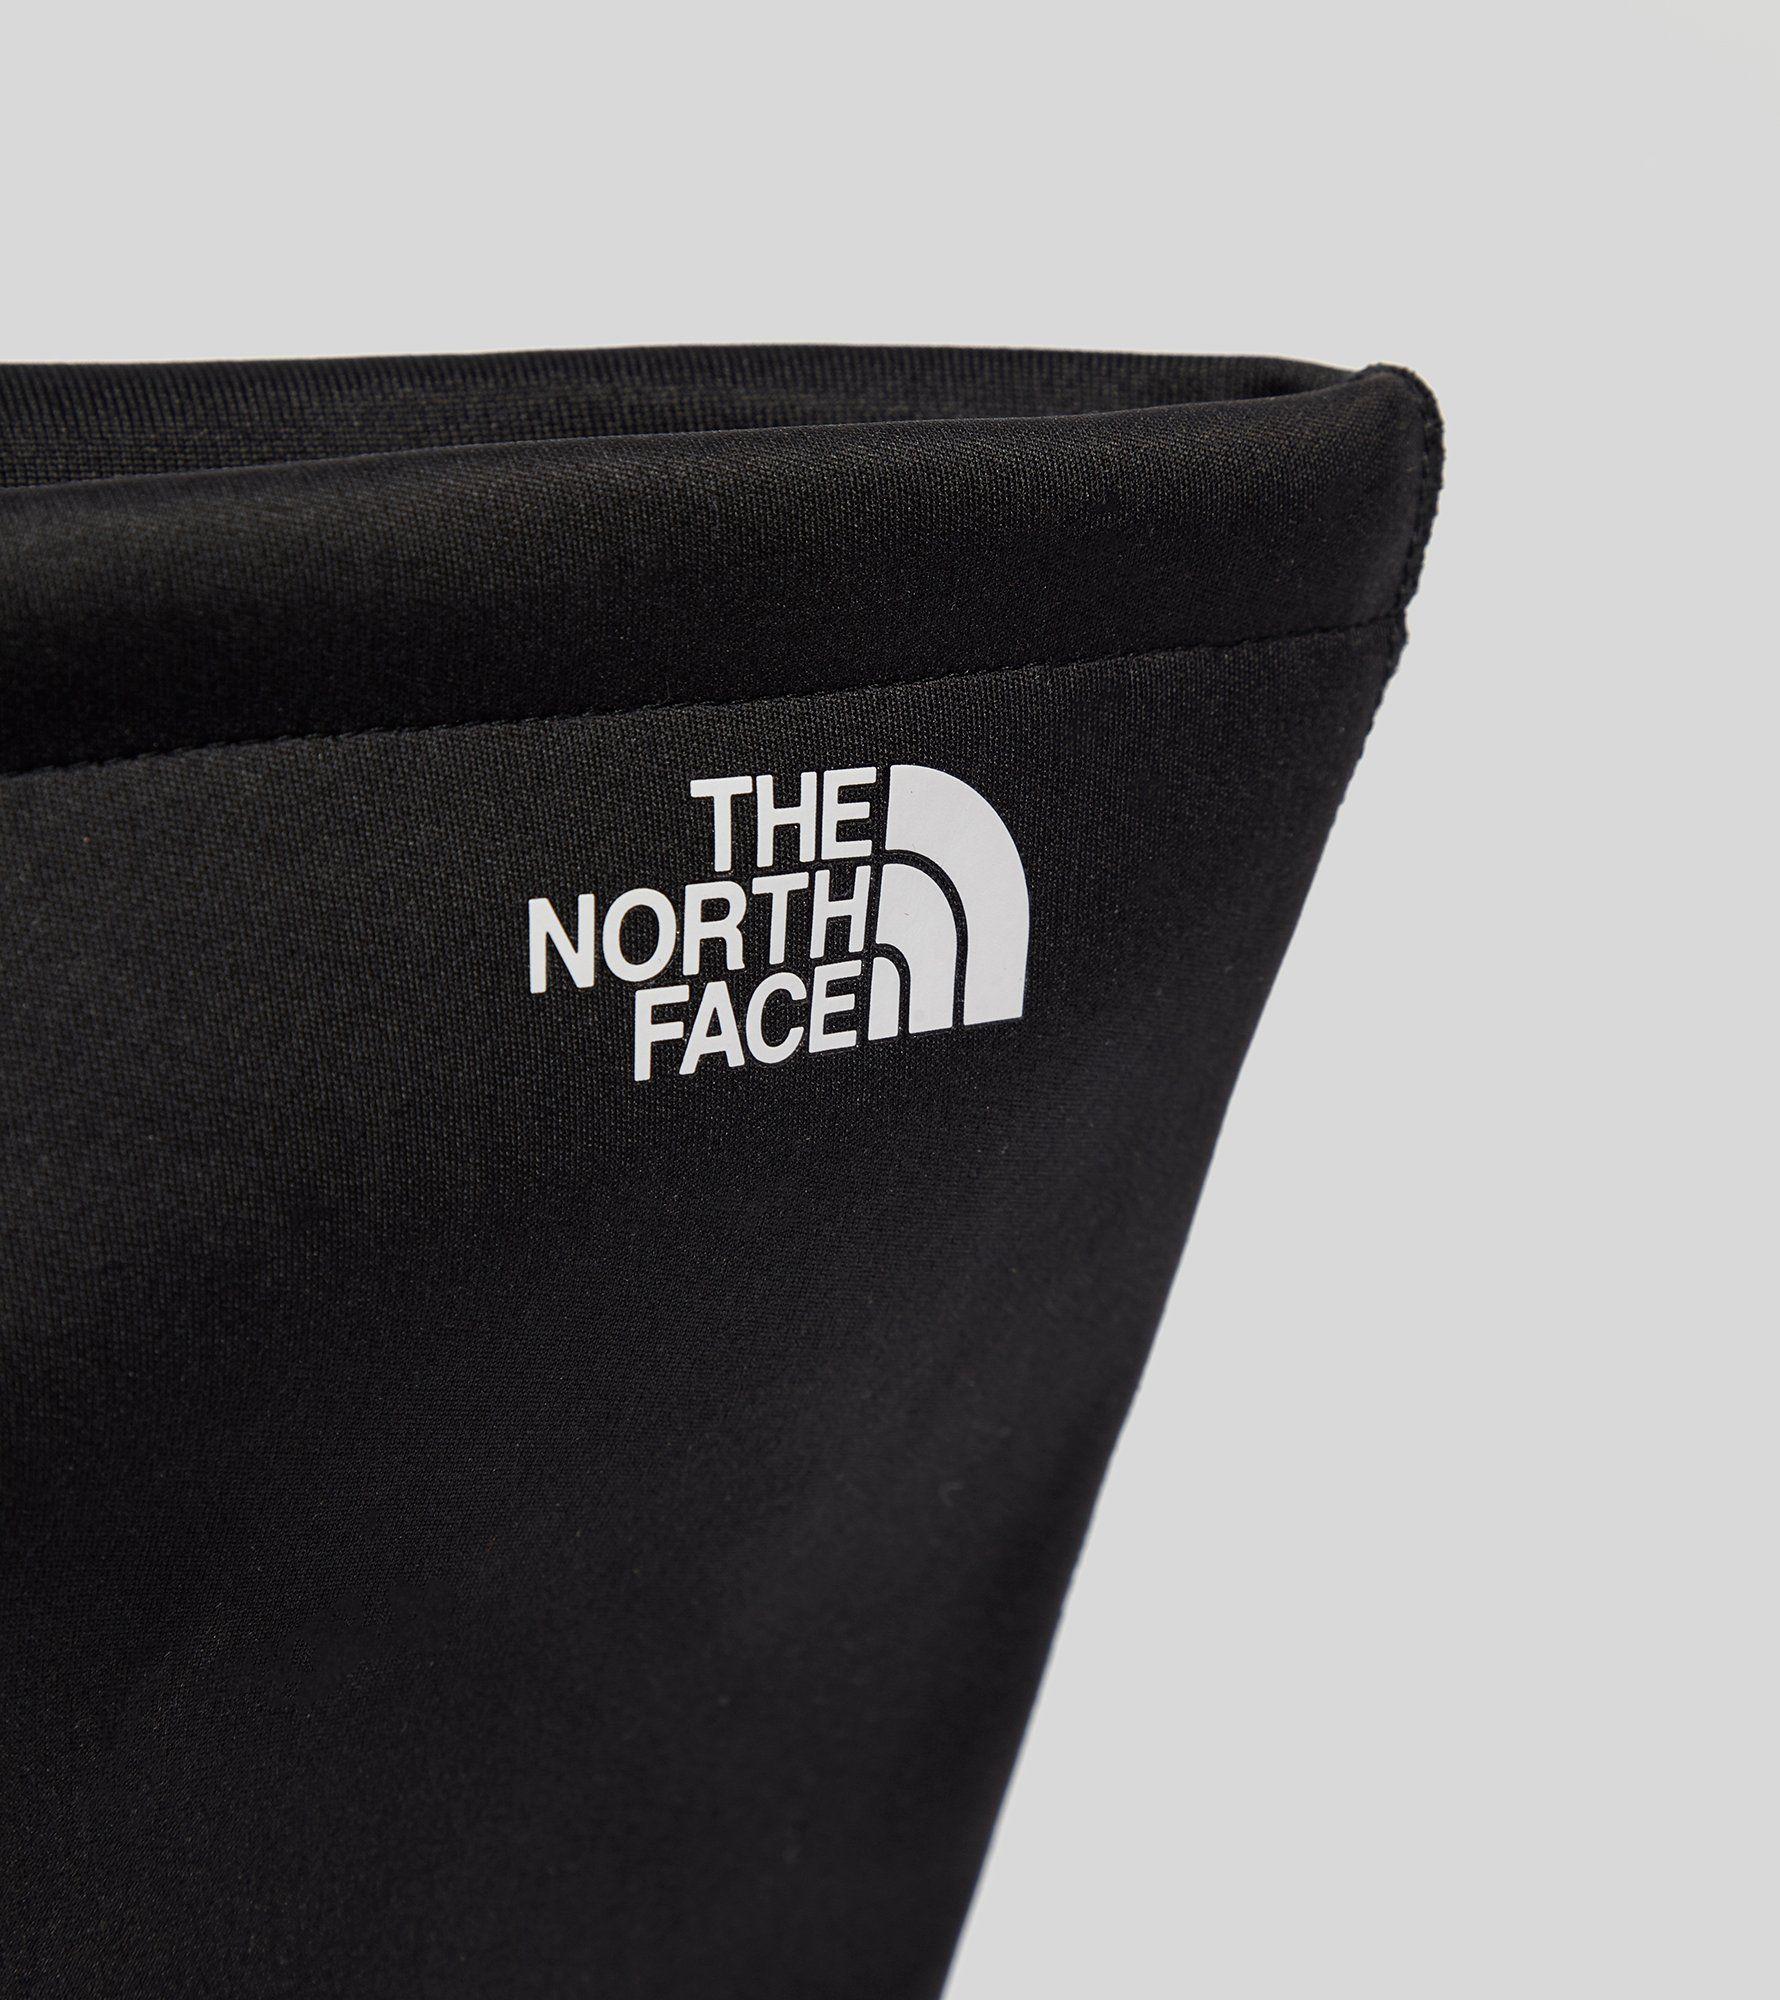 The North Face Neck Gaiter